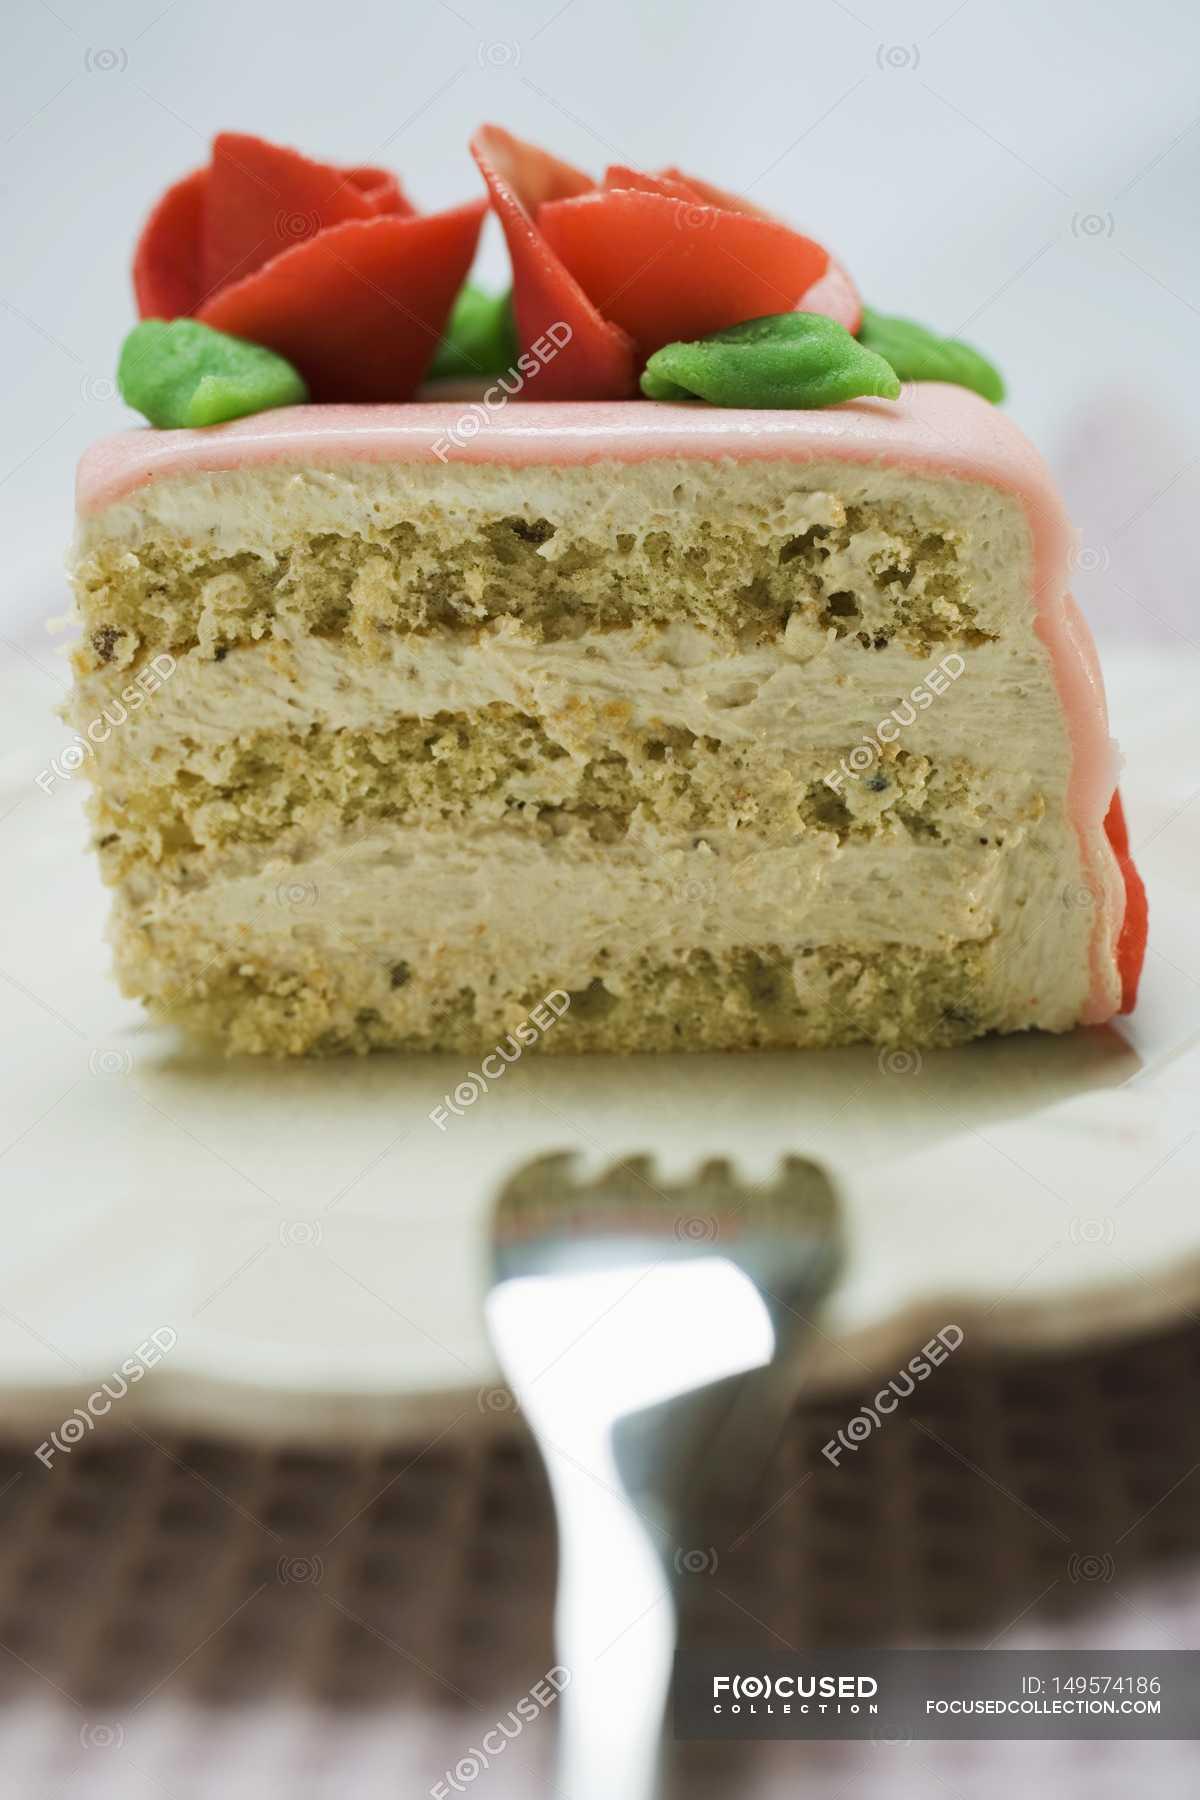 Astonishing Piece Of Birthday Cake Food Gastronomy Stock Photo 149574186 Personalised Birthday Cards Petedlily Jamesorg